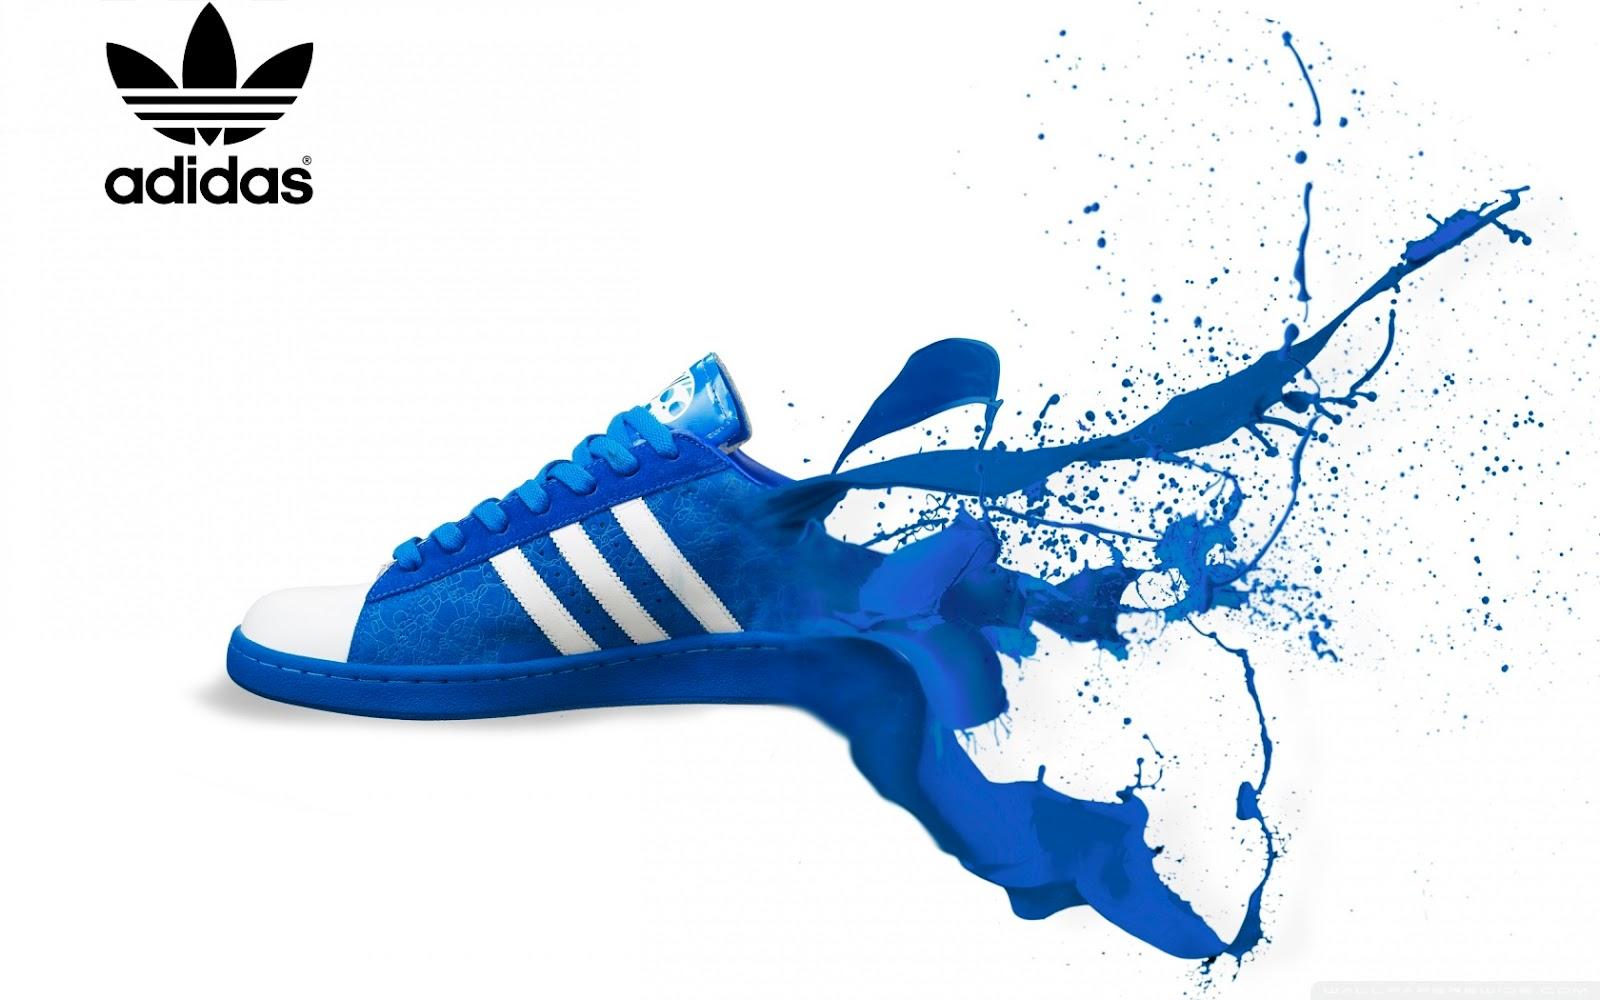 Central Wallpaper Adidas Logo HD Wallpapers 1600x1000